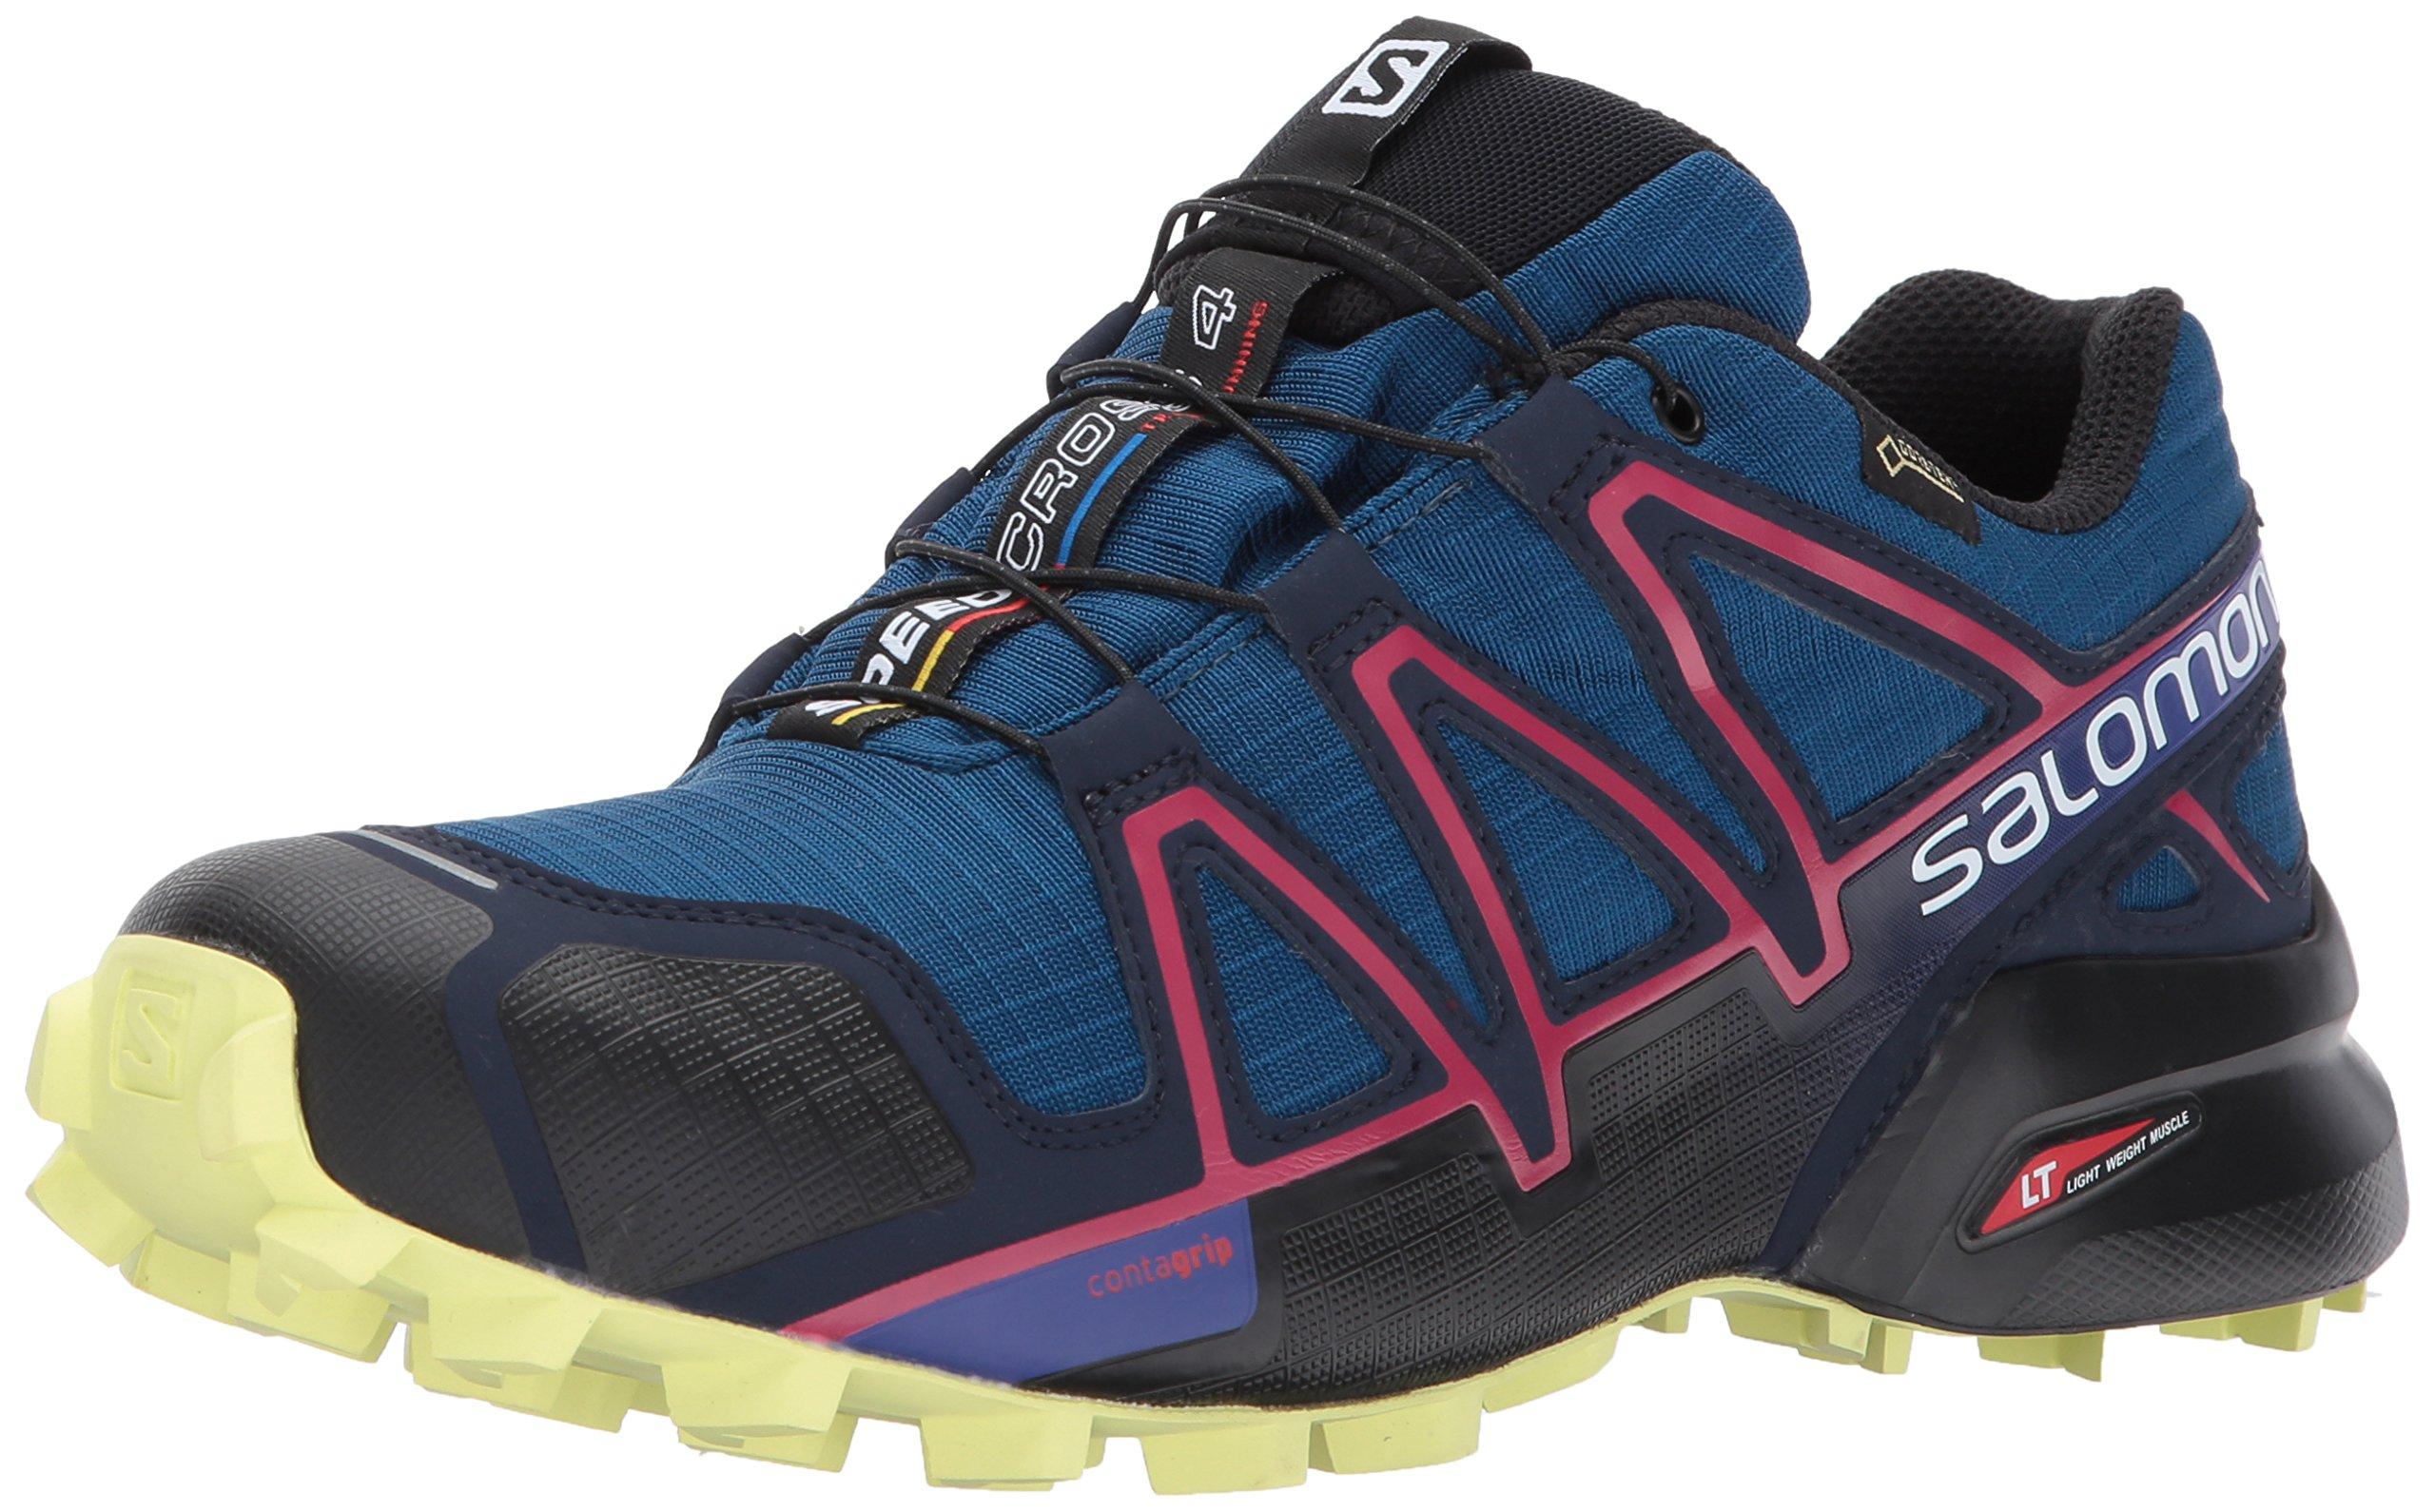 Salomon Women's Speedcross 4 Gtx W Mountaineering Boot, Poseidon/Virtual Pink/Sunny Lime, 11 M US